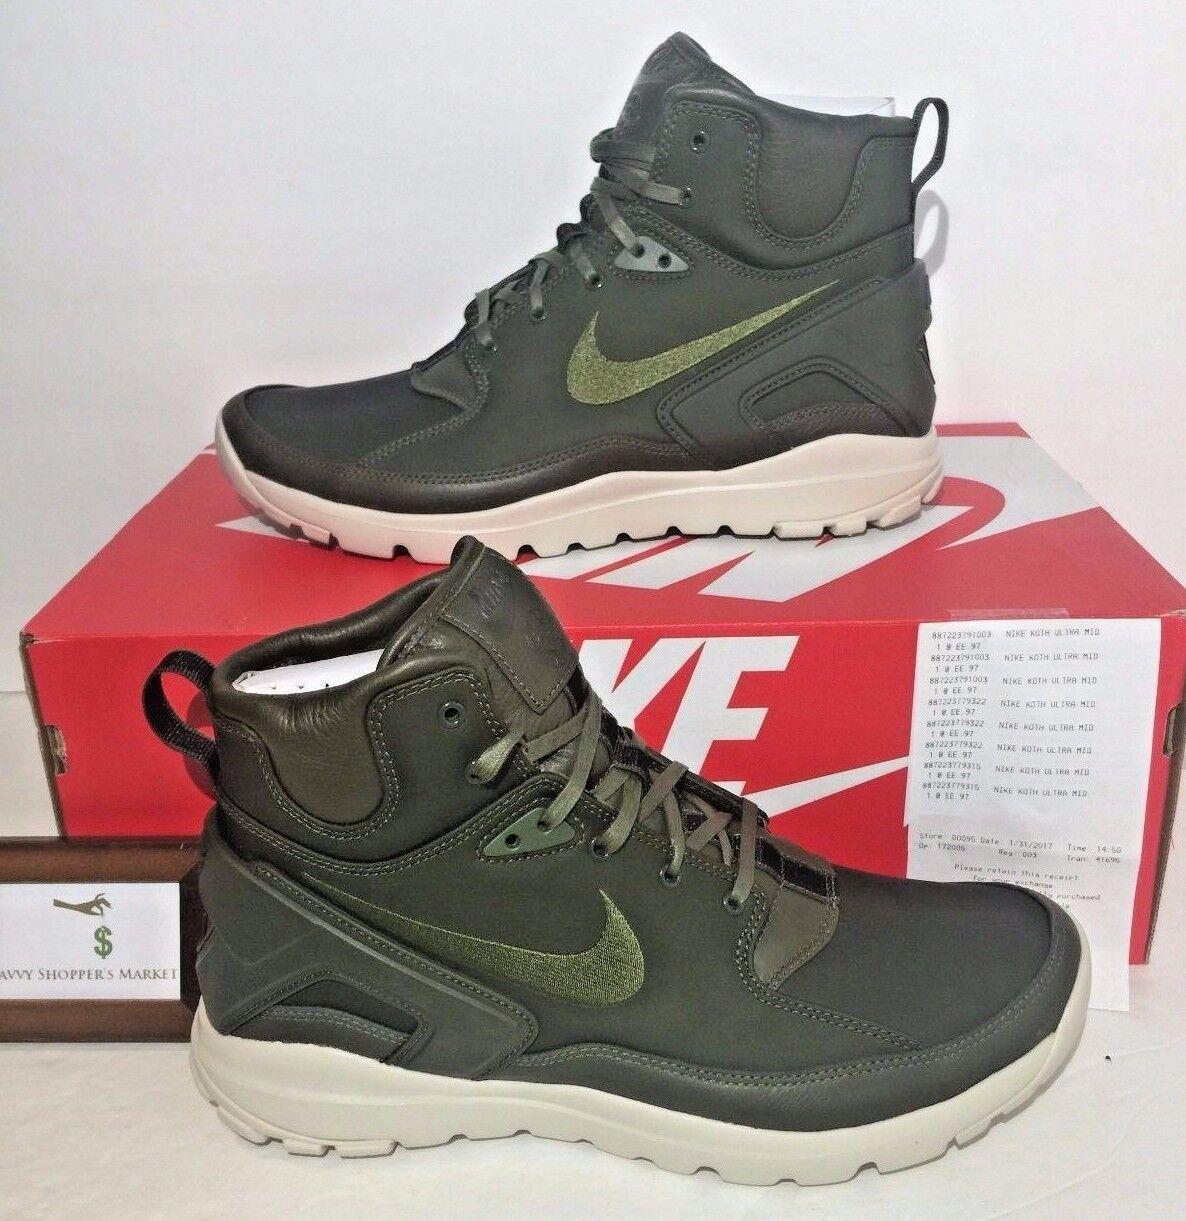 Nike Uomo sz metà 10 nikelab koth ultra metà sz e stone island esercito gli stivali verdi borsa 326bfc